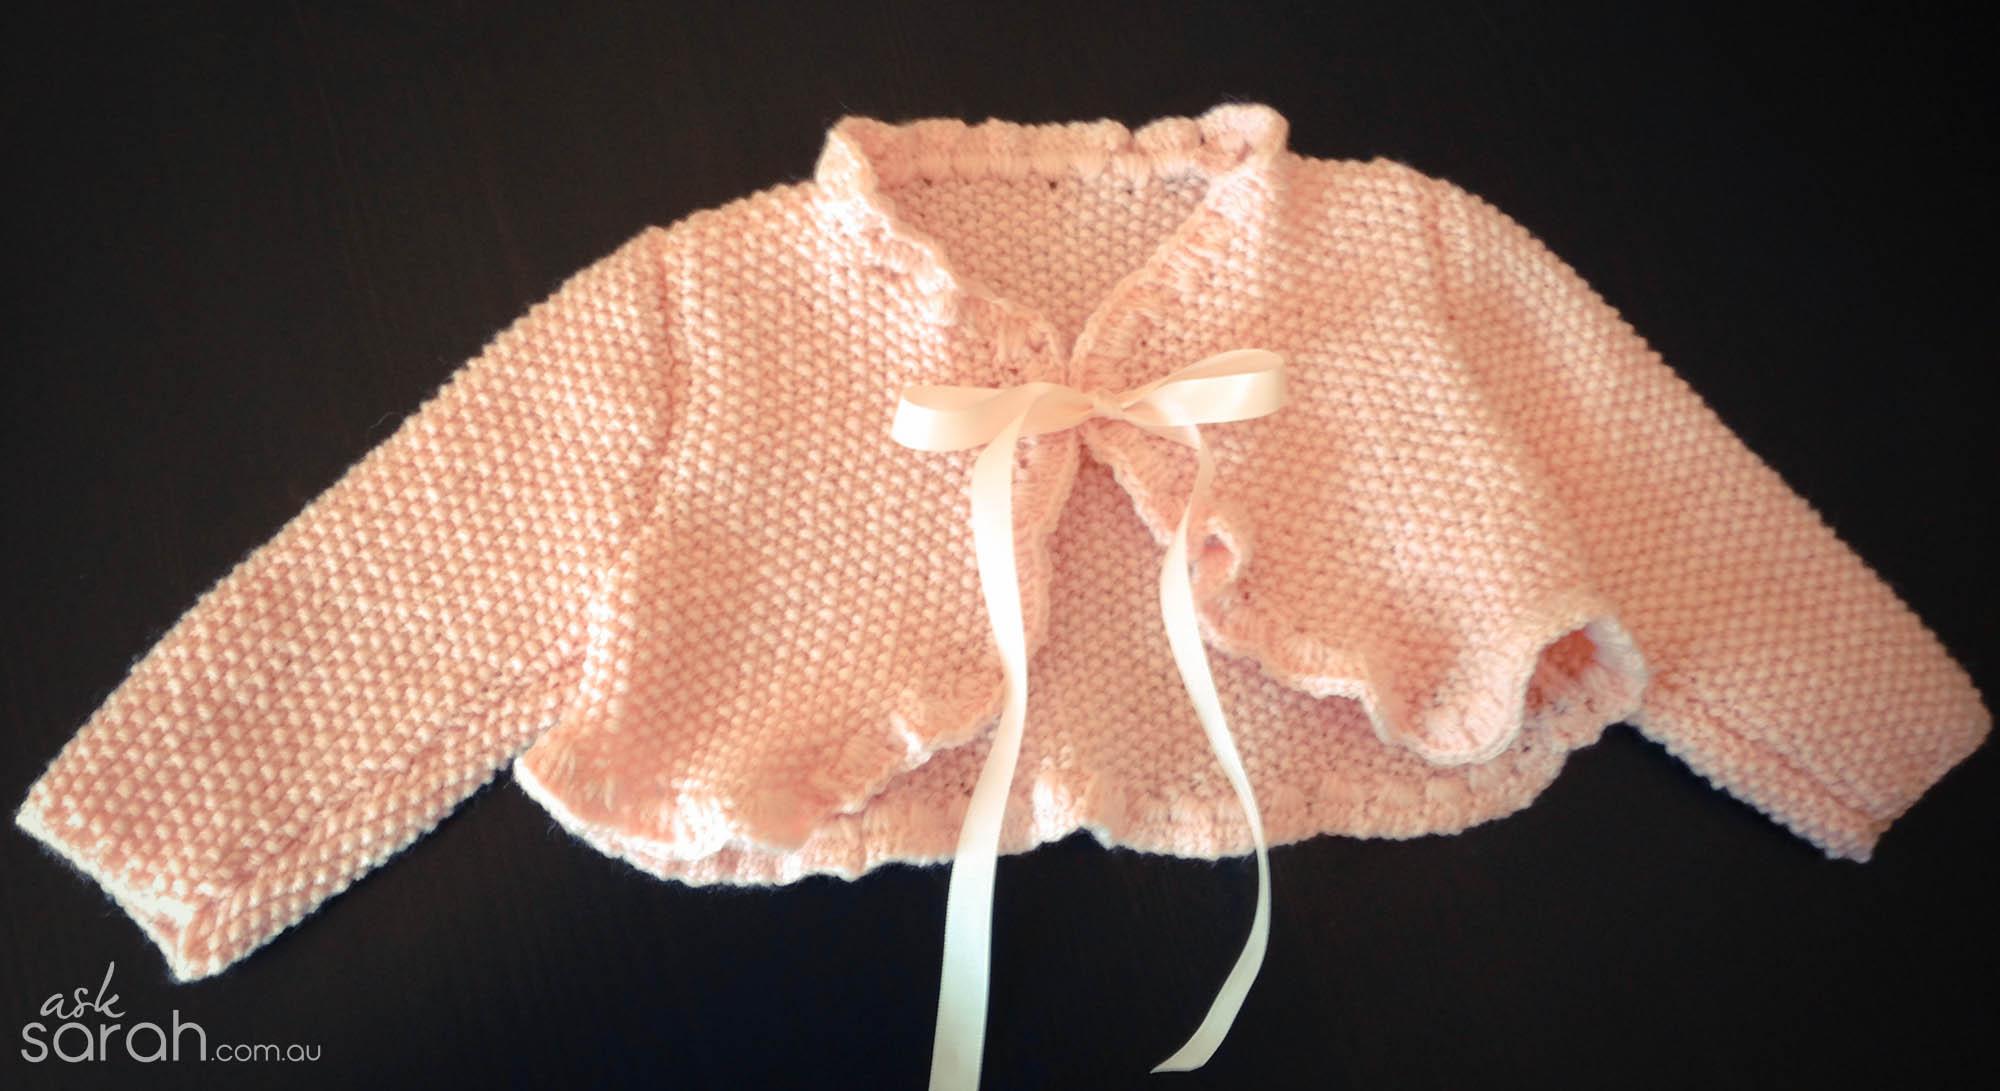 Craft: Knitted Baby Bolero Jacket